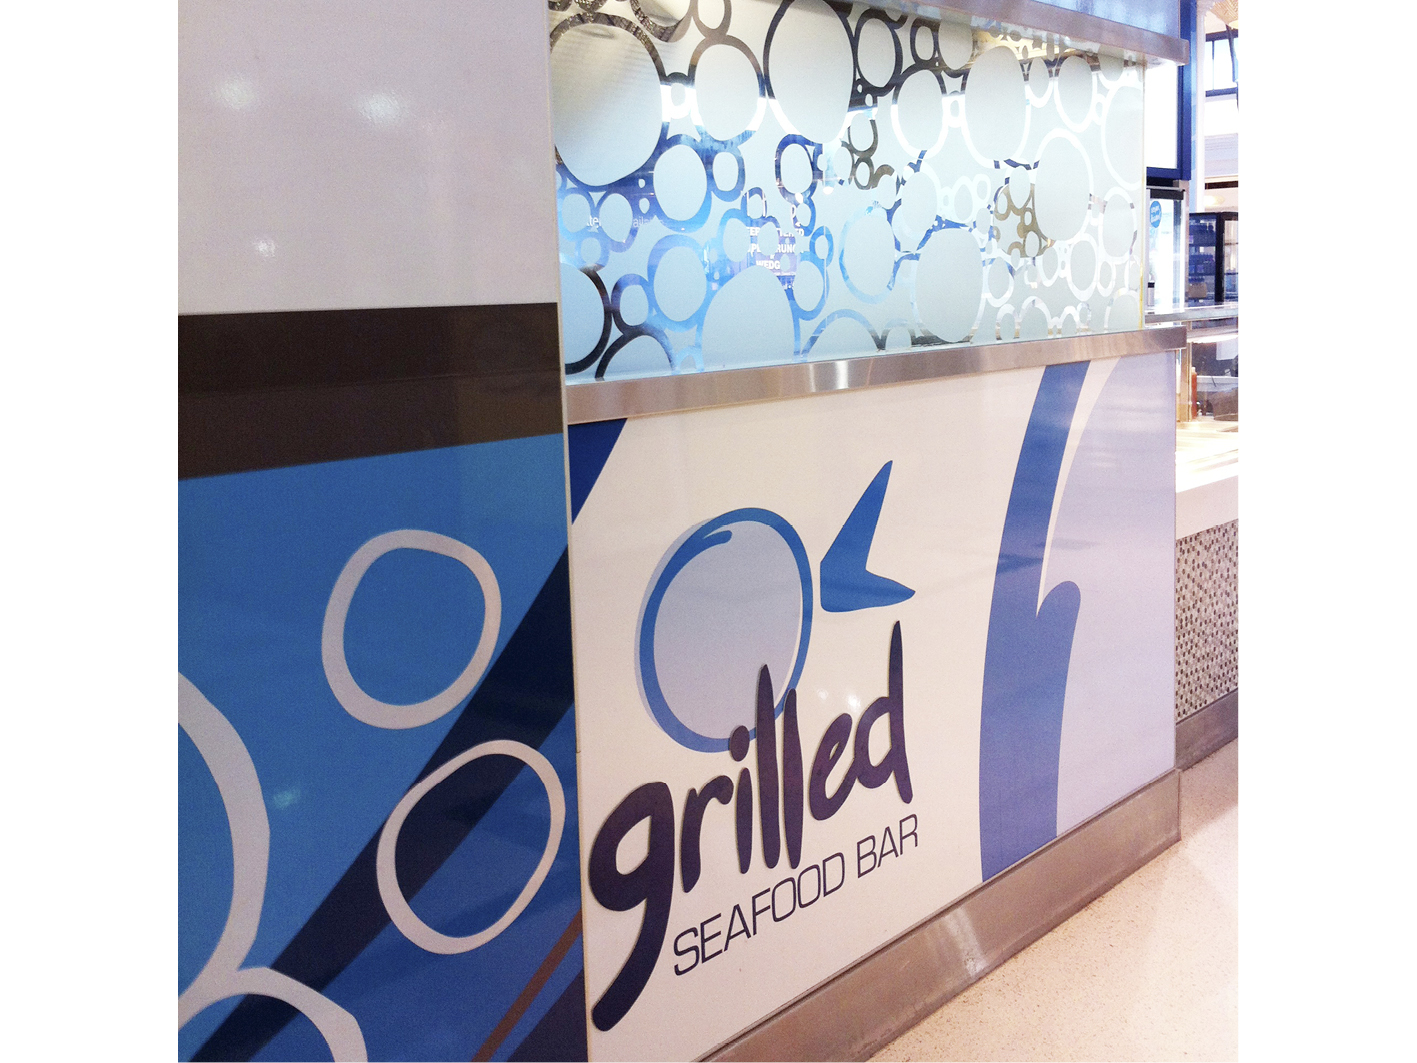 Grilled Seafood - latest design by Gold Coast retail designers Cuschieri Design